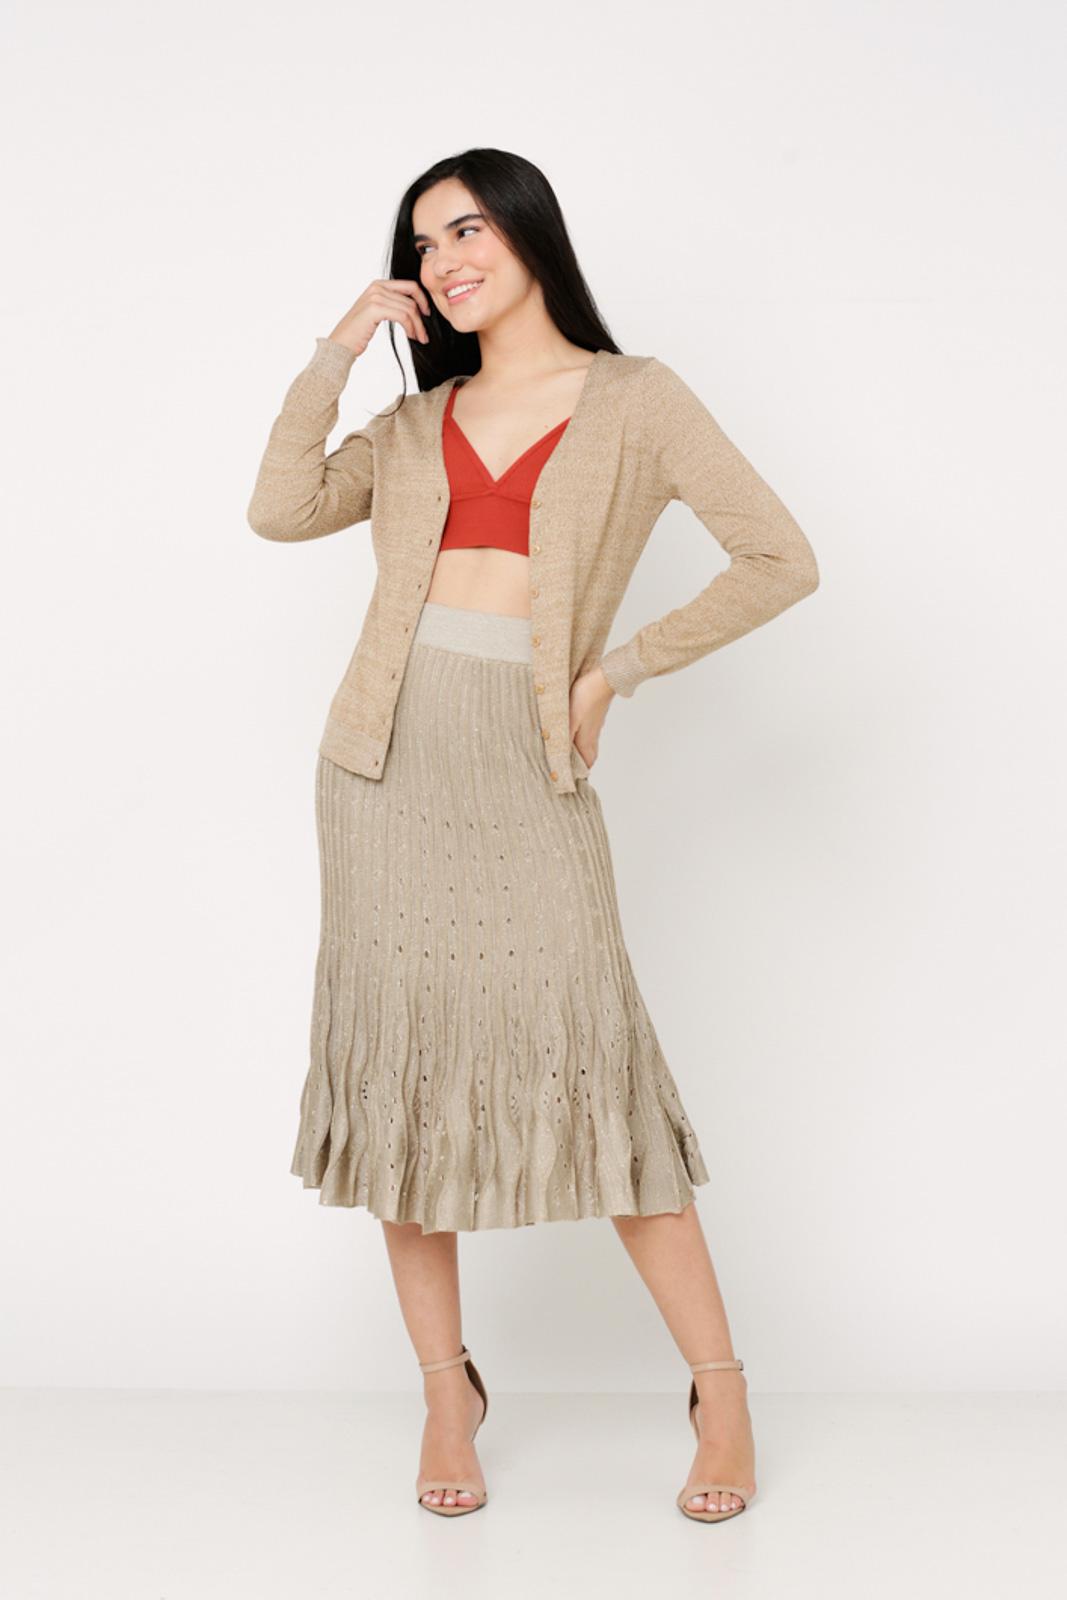 Conjunto de tricot Ralm saia midi nervuras com top e casaco básico botões - Laranja